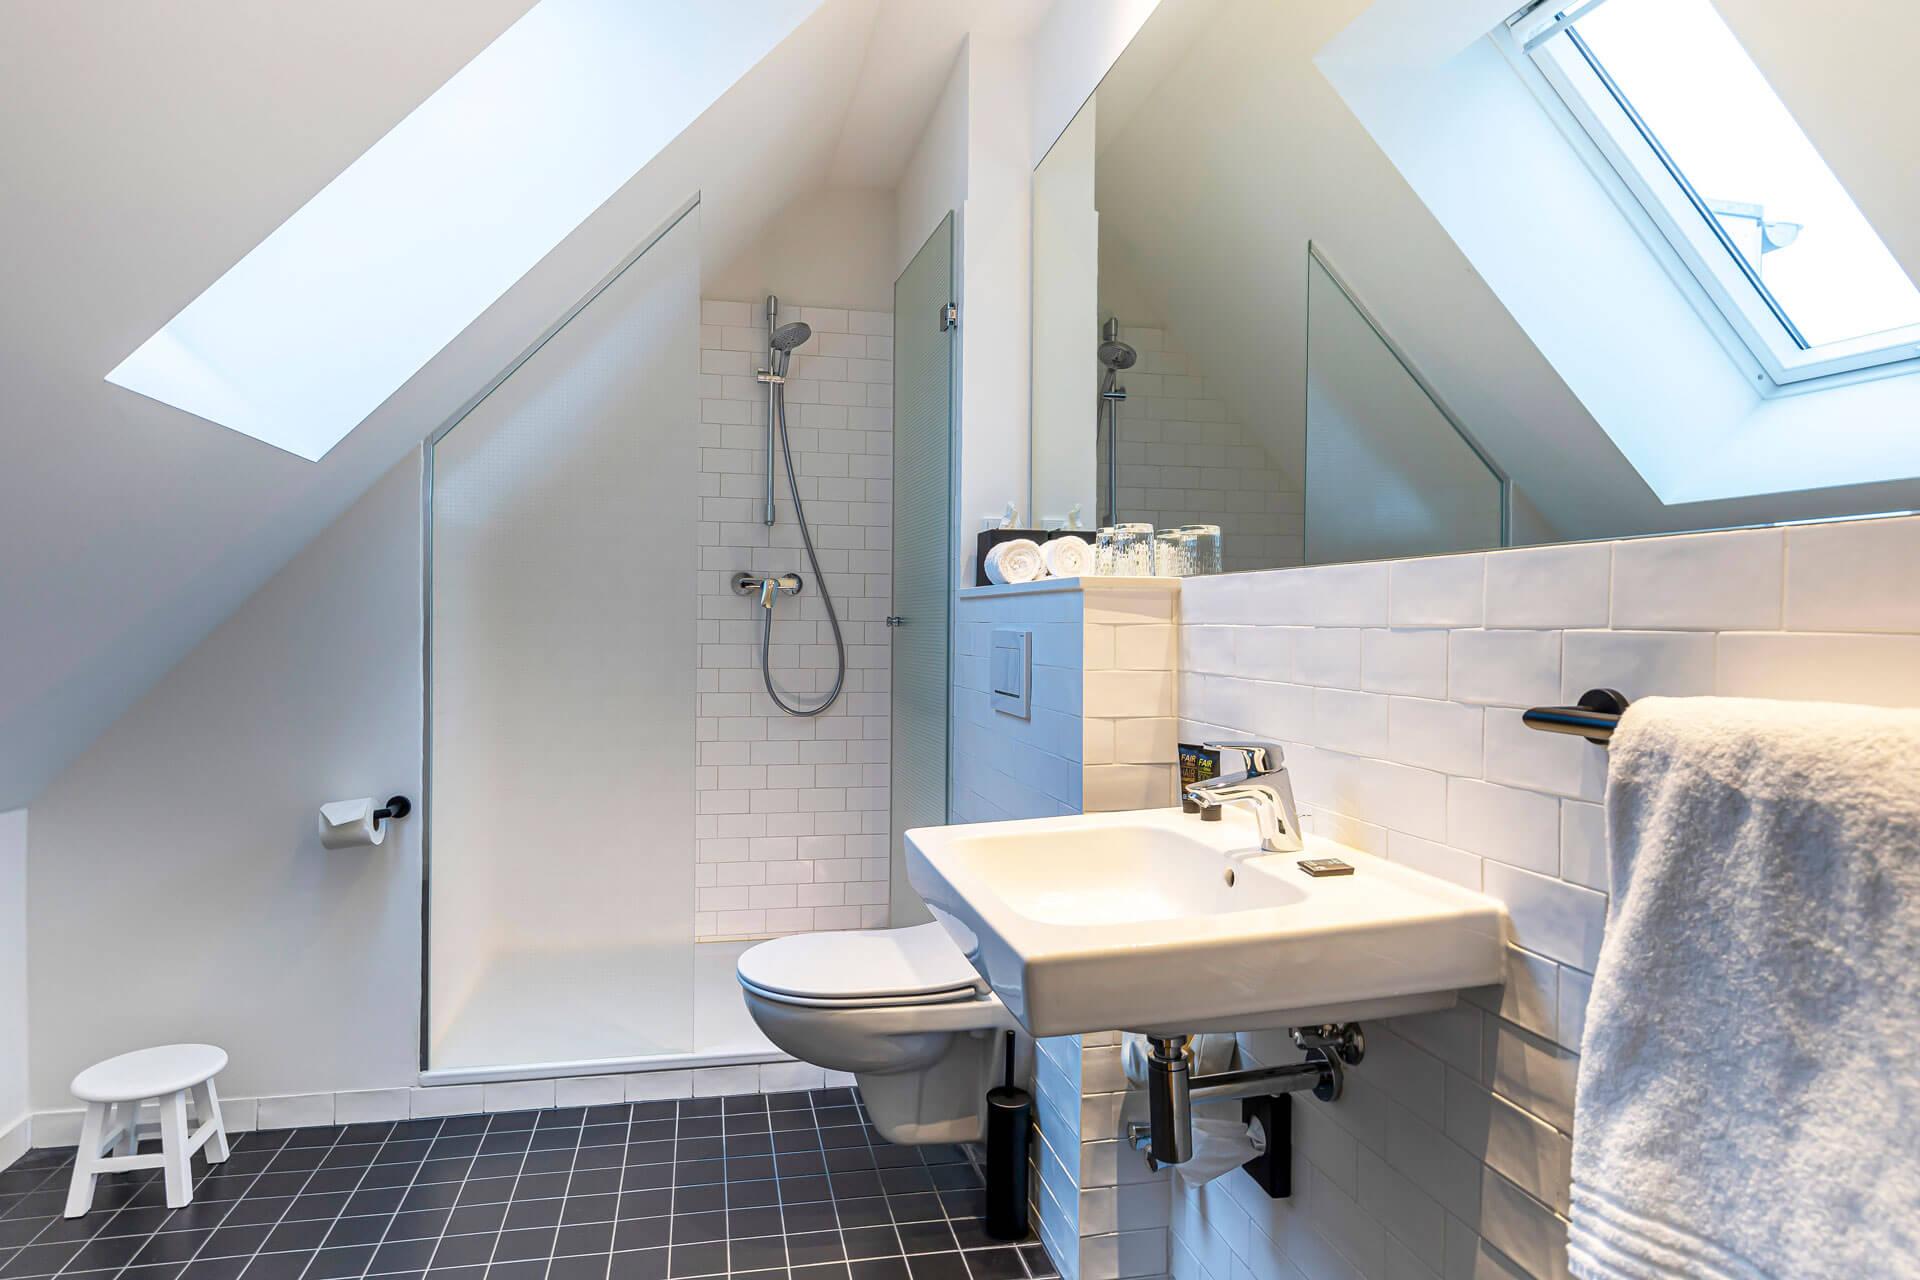 Hotel-Meerzeit-Doppelzimmer DZ Deluxe_Badezimmer